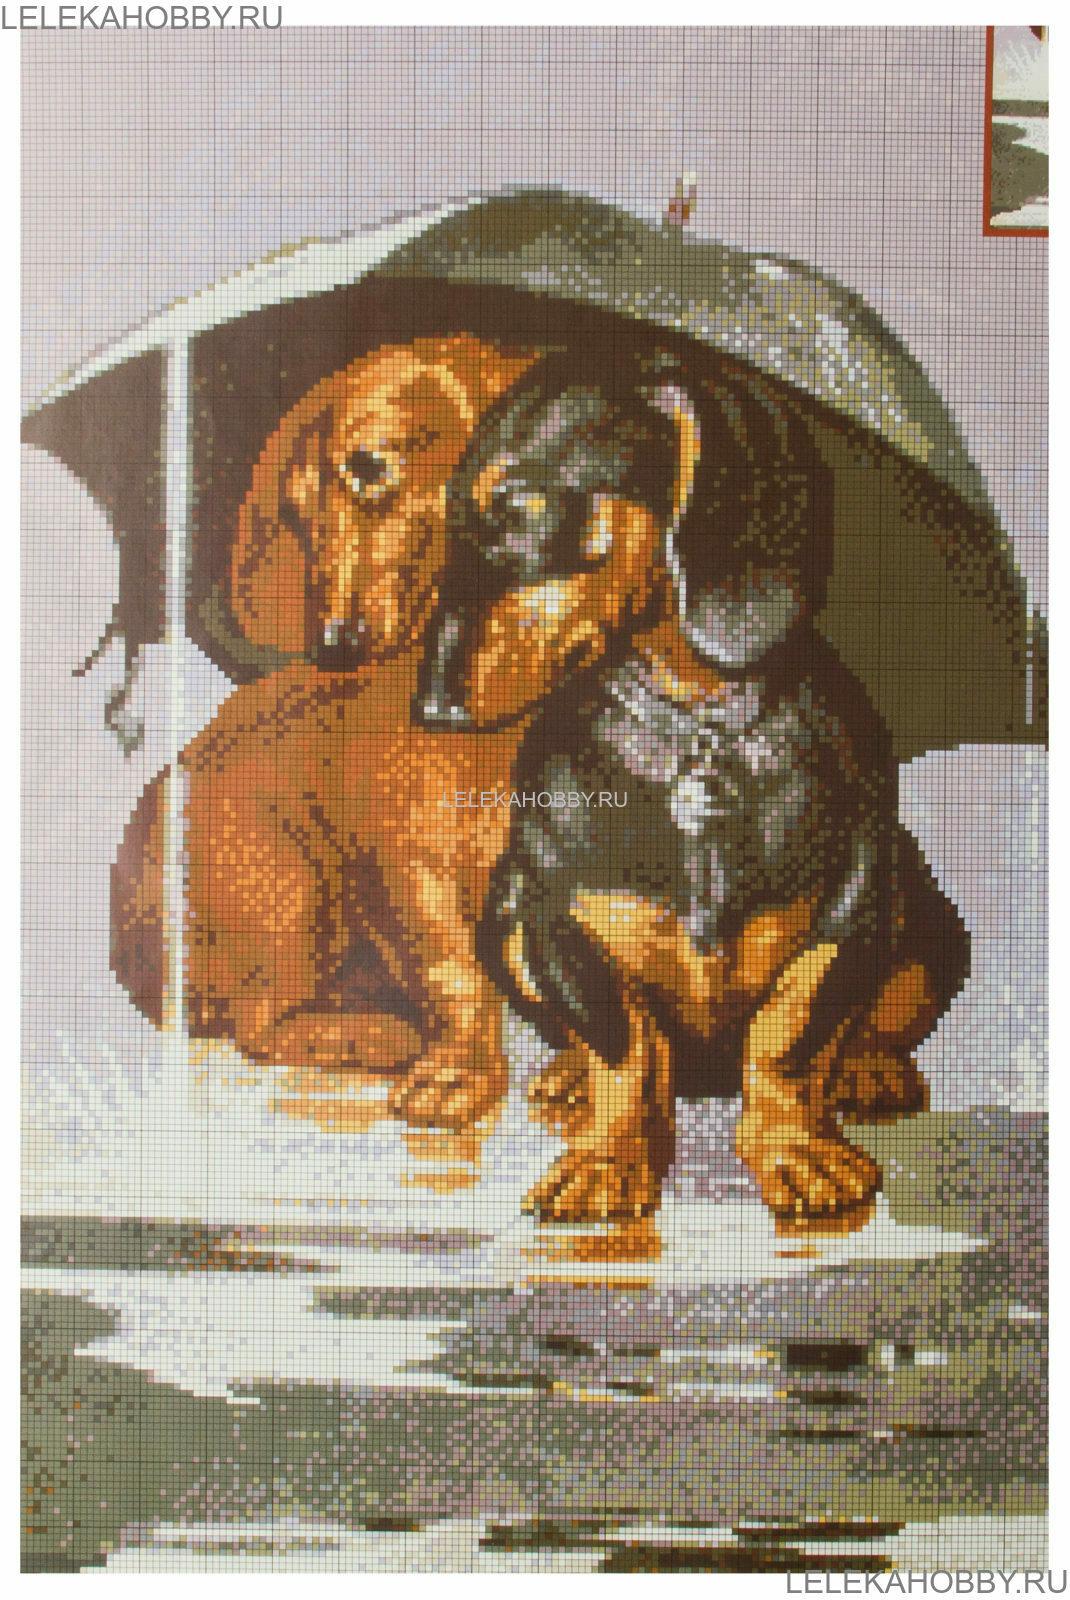 вышивка собака такса схема